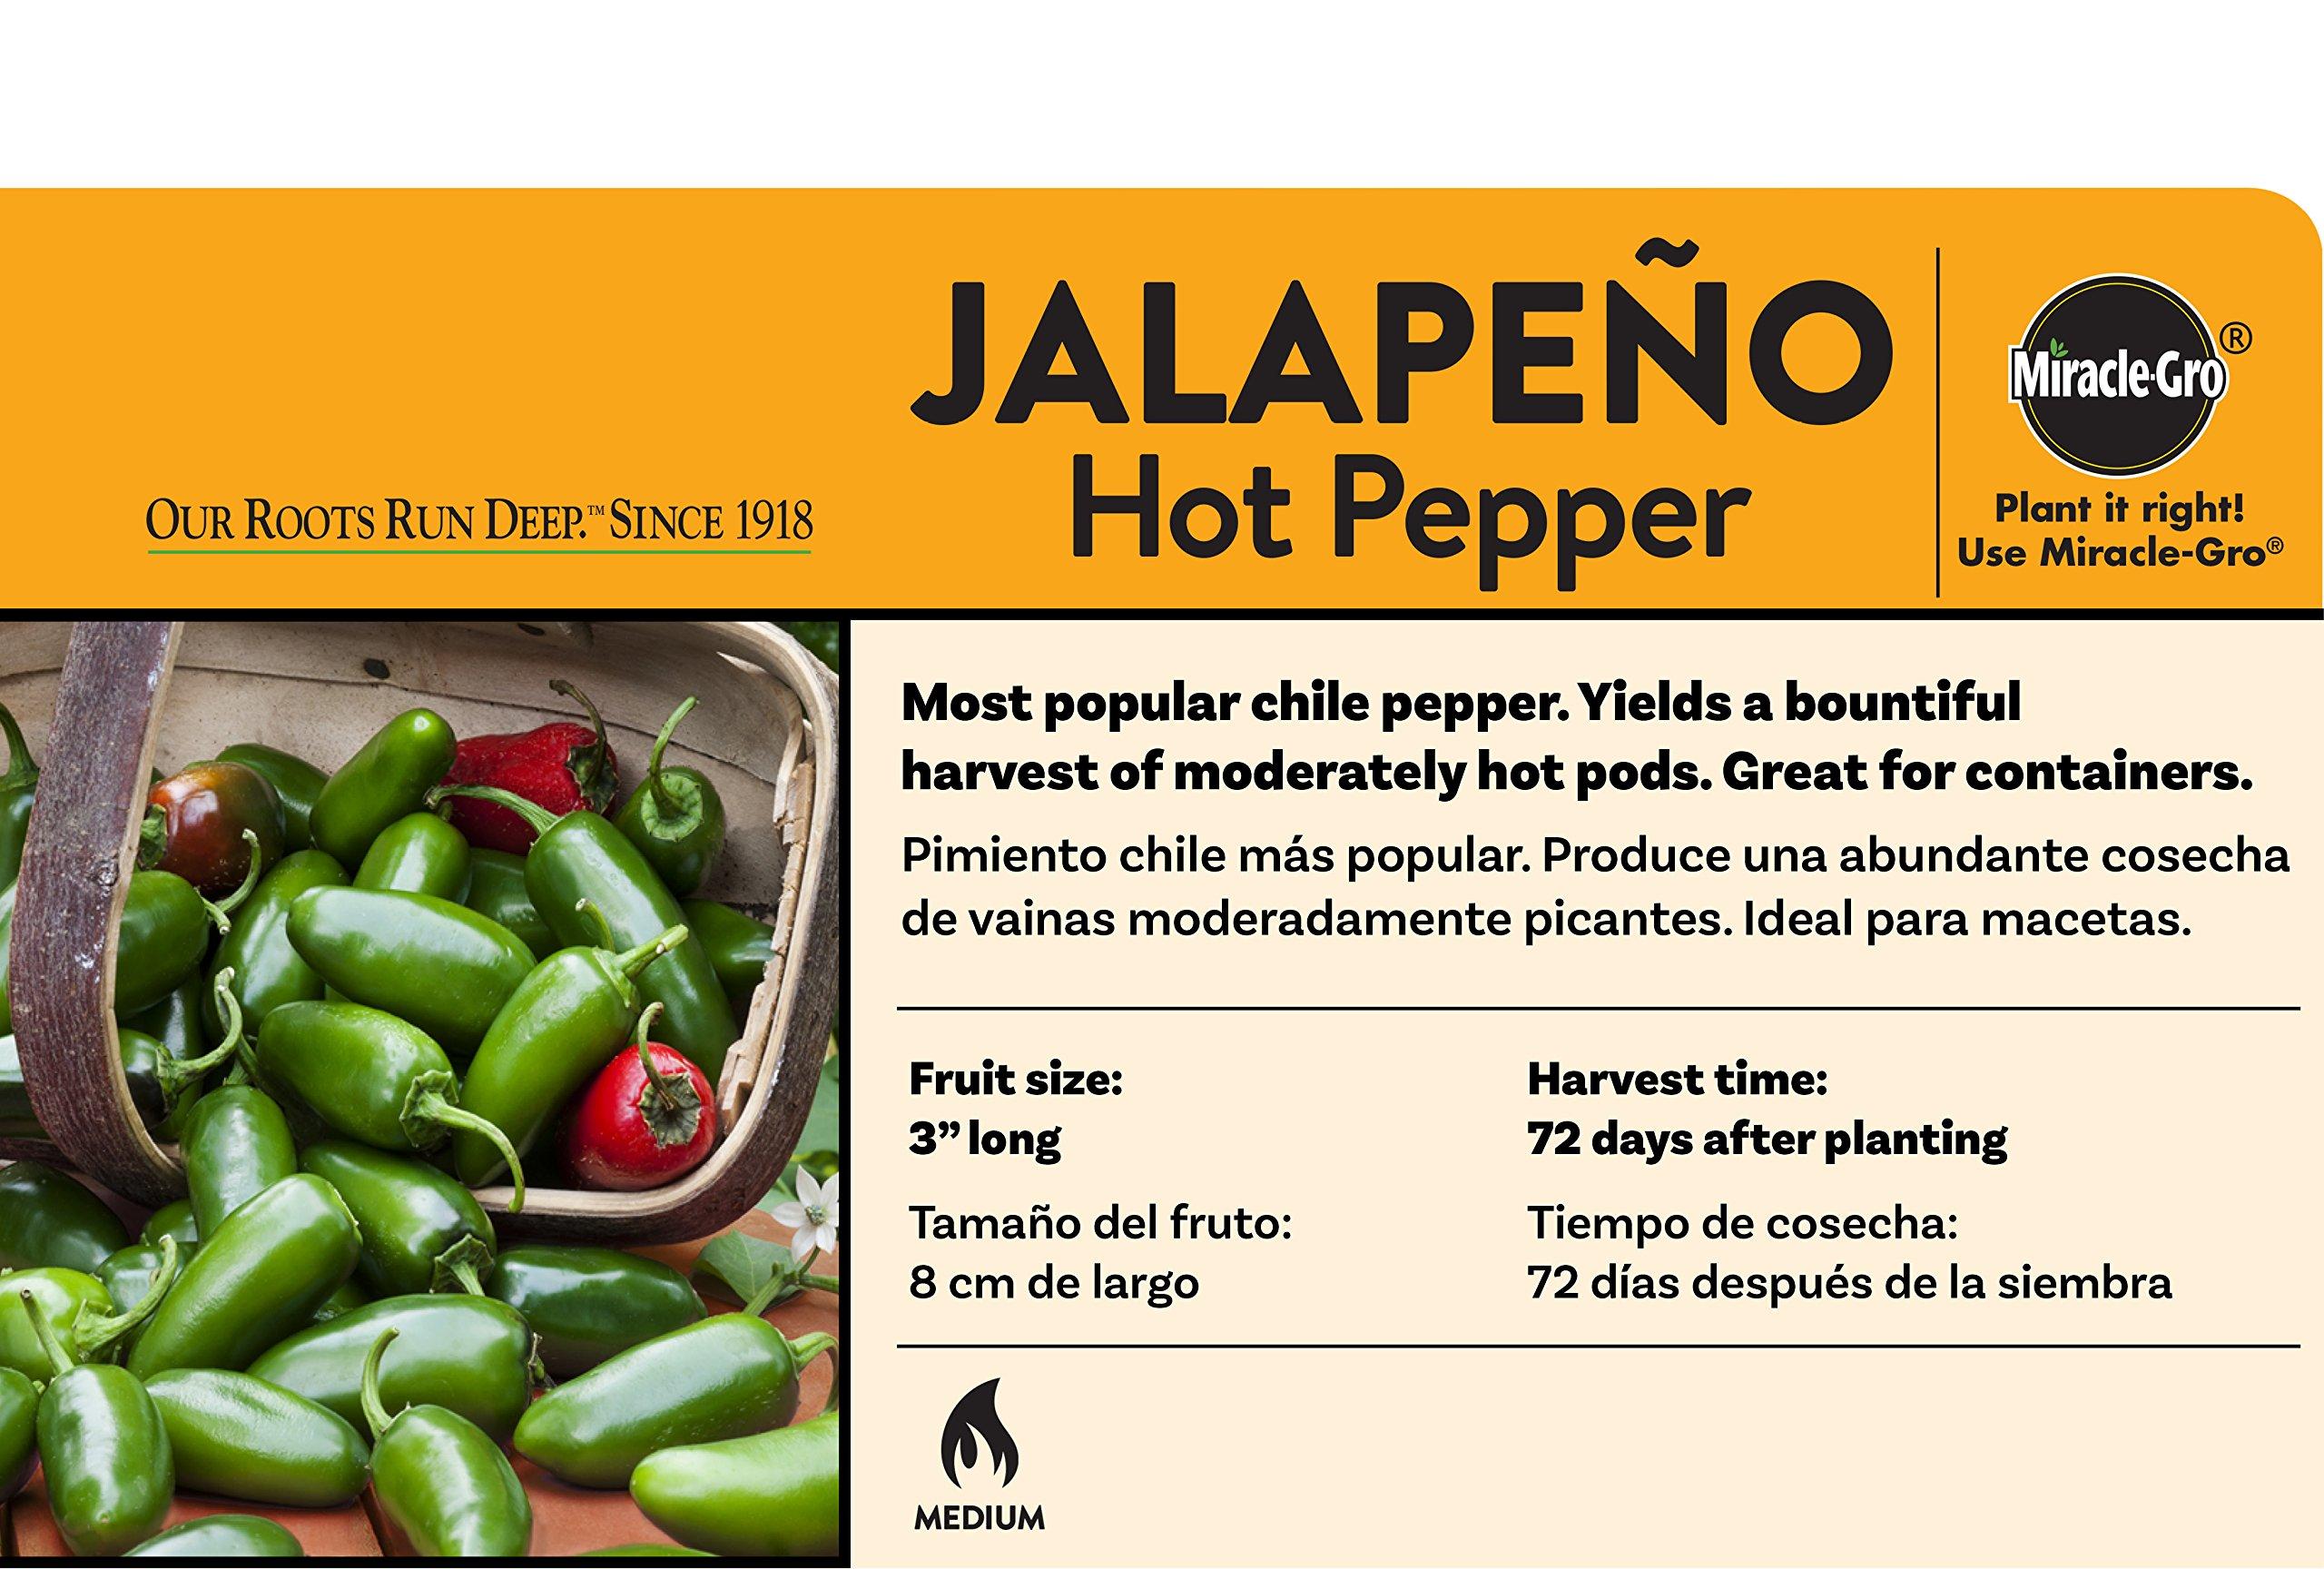 Bonnie Plants Jalapeno Hot Pepper Live Vegetable Plants - 4 Pack | Most Popular Chile Pepper | Non-GMO | 24 - 48 Inch Plants | 3 Inch Pepper Size by Bonnie Plants (Image #3)